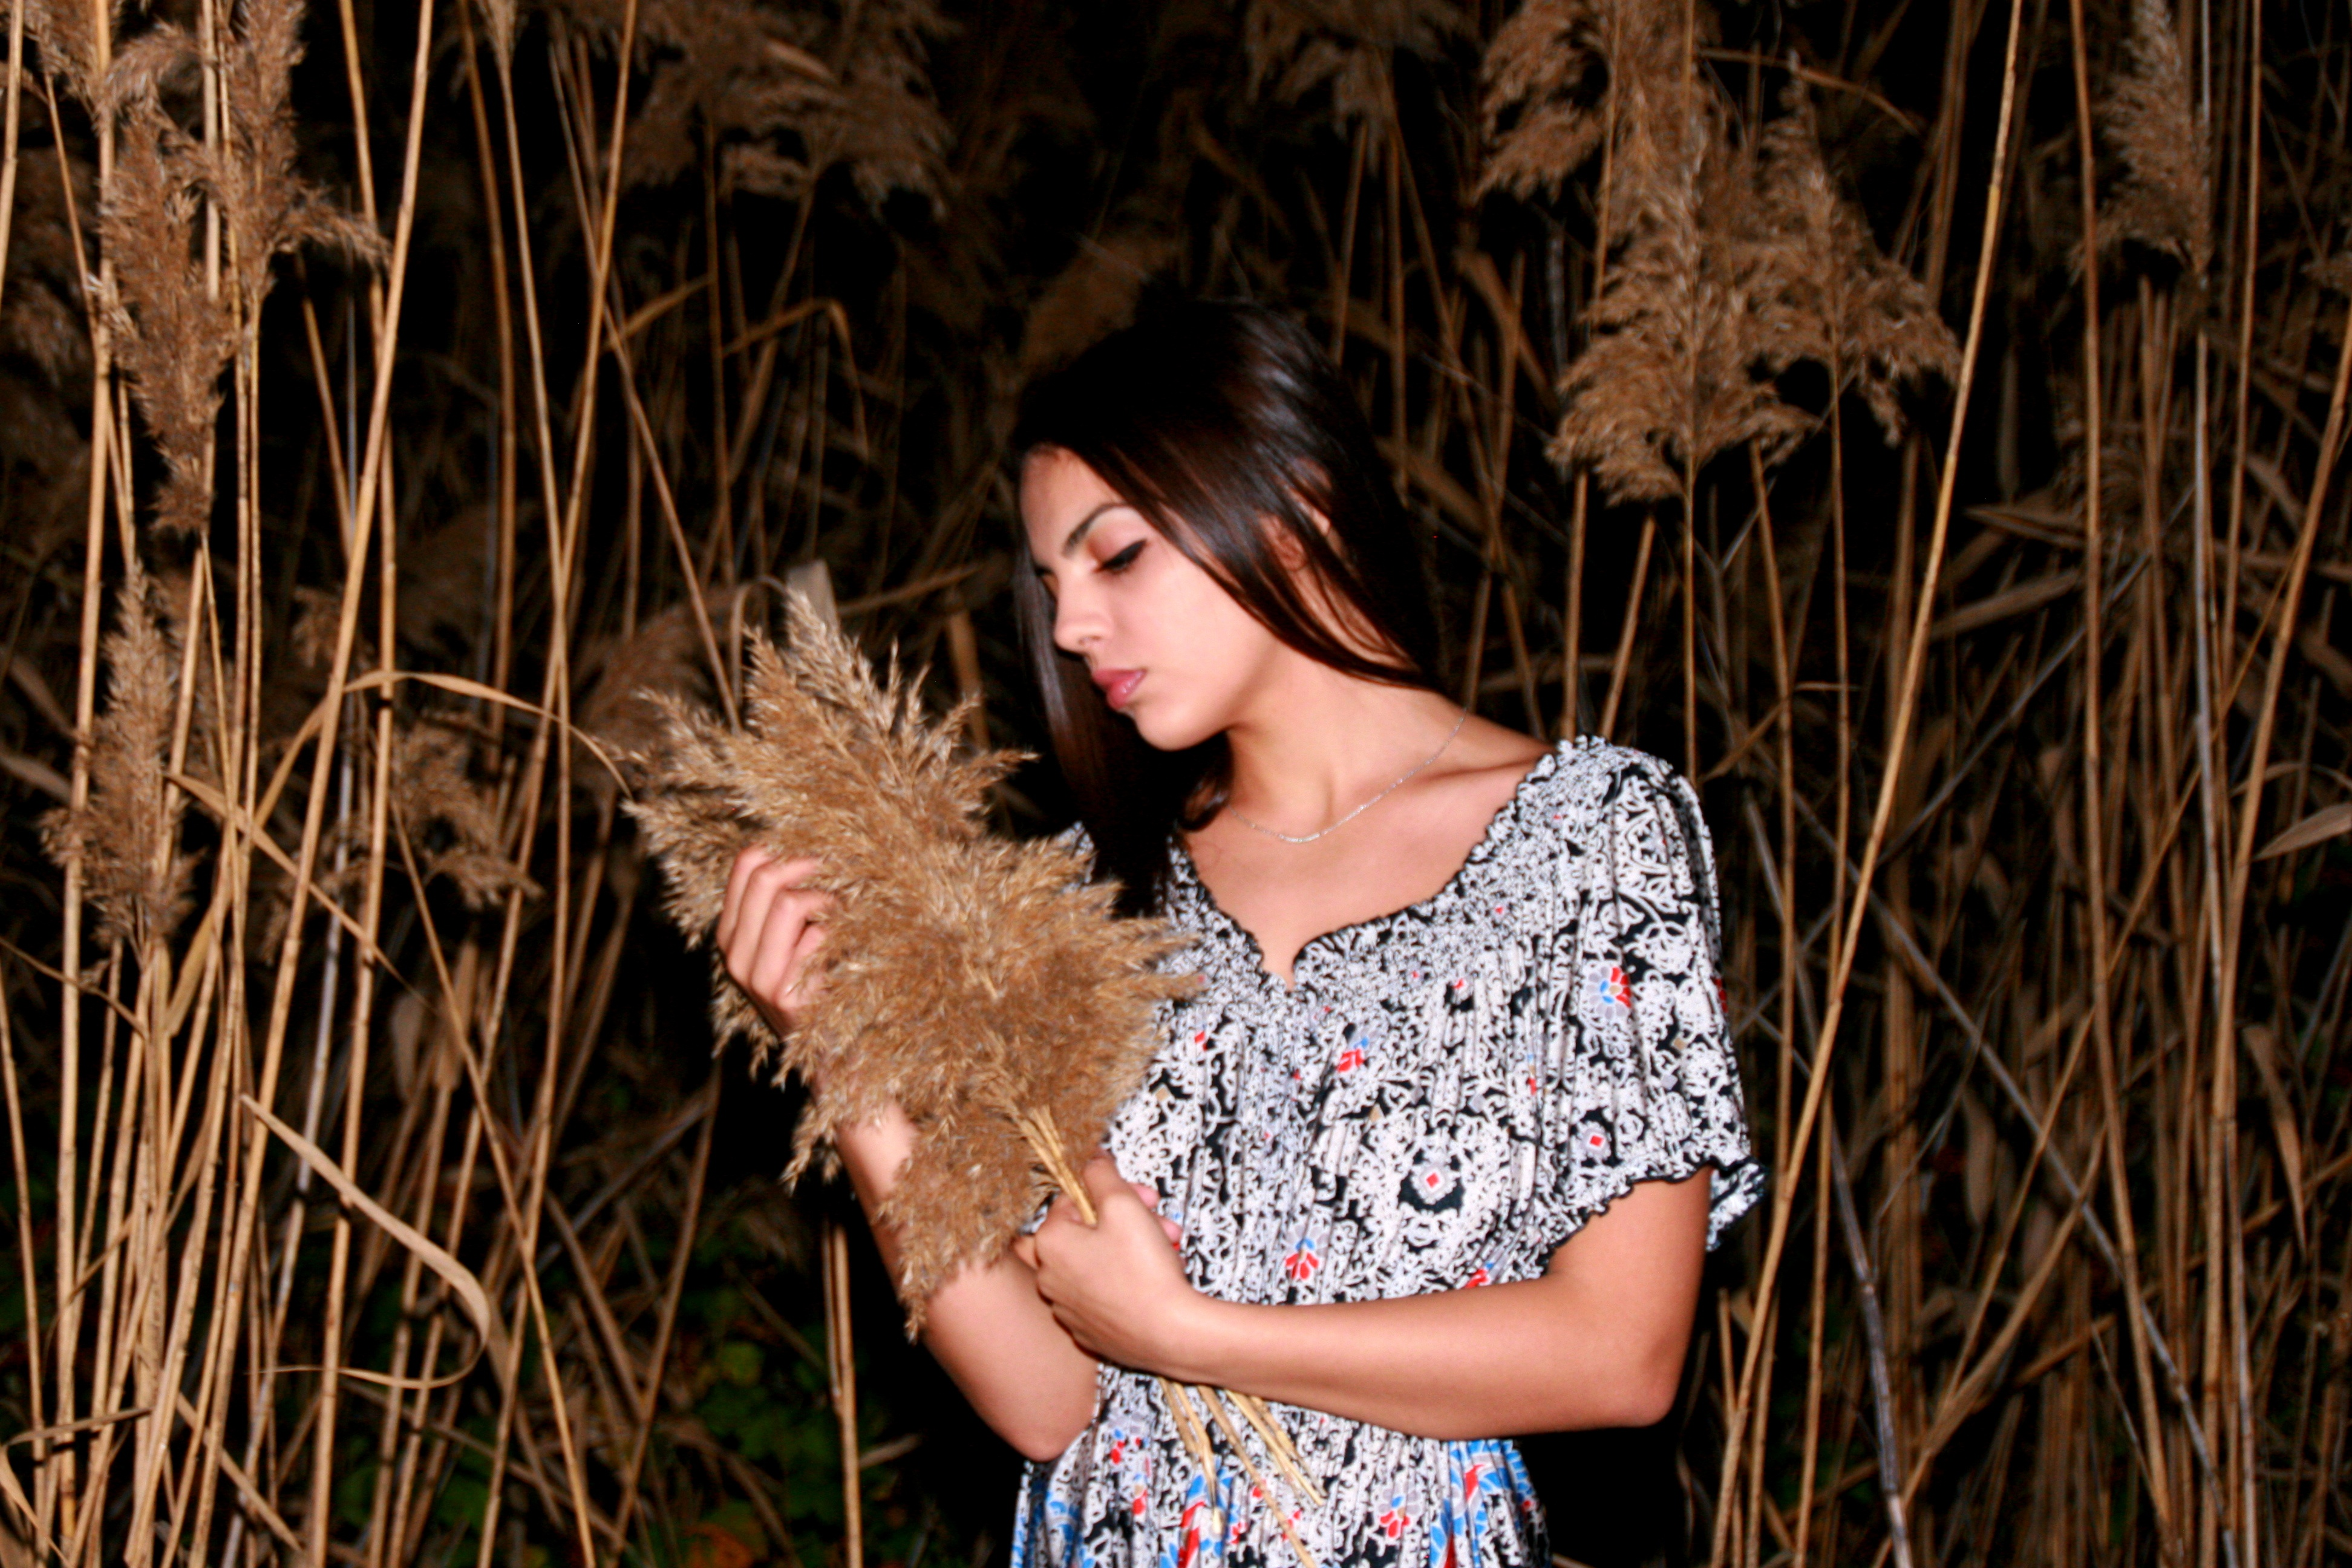 Wild Plants, Girl, Portrait, Pose, Wild, HQ Photo